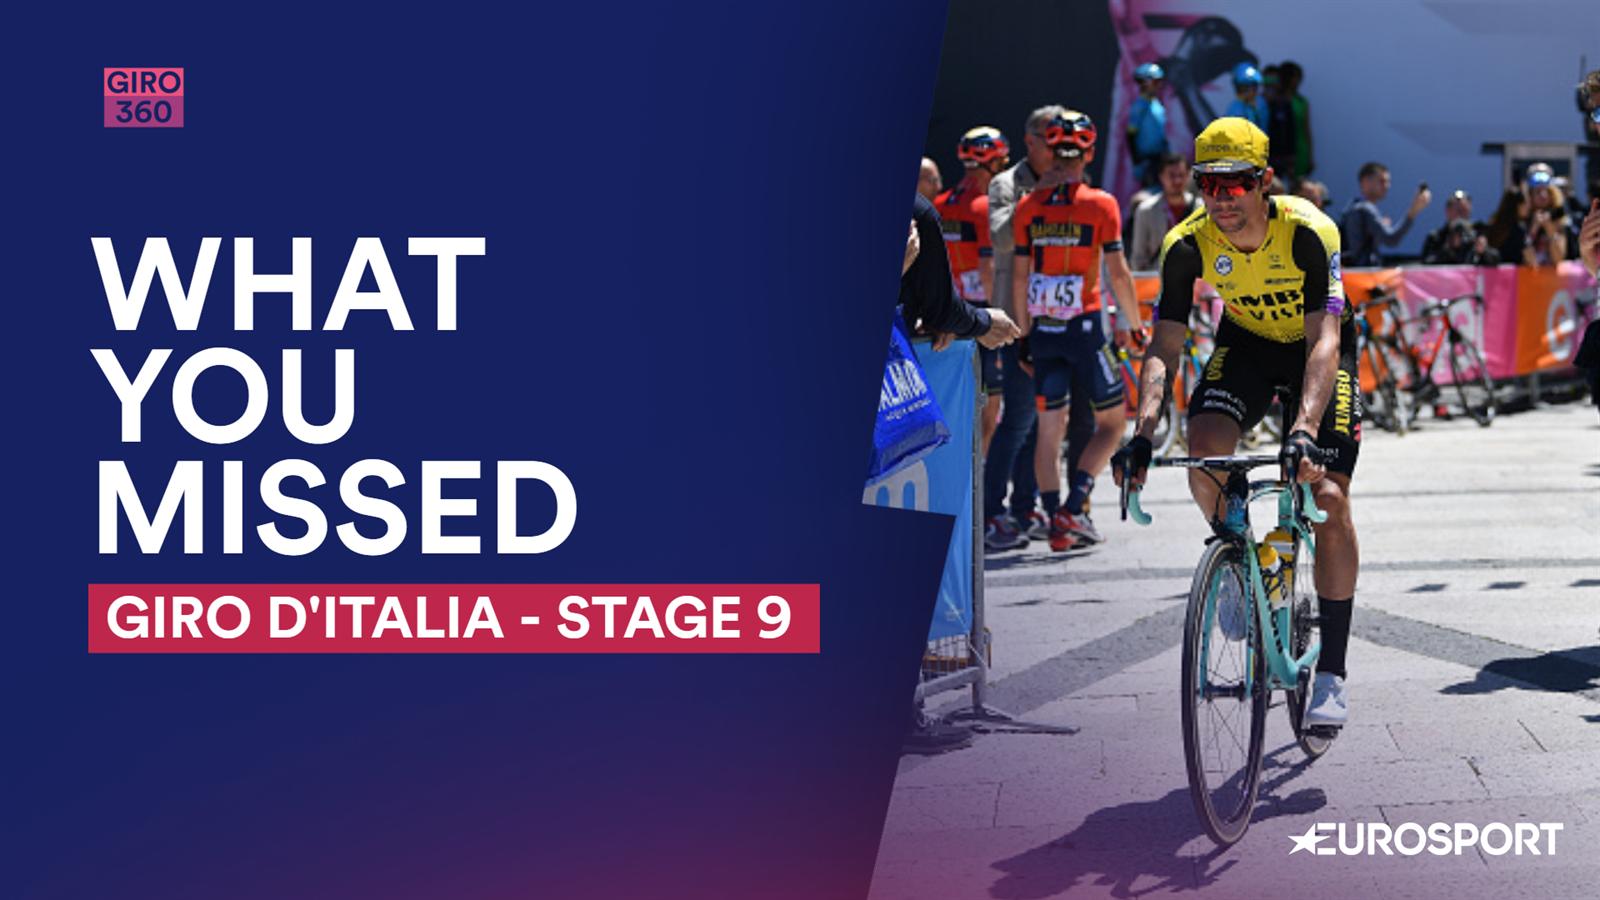 VIDEO - Giro d'Italia 2019: Victor Campenaerts rues 'rookie